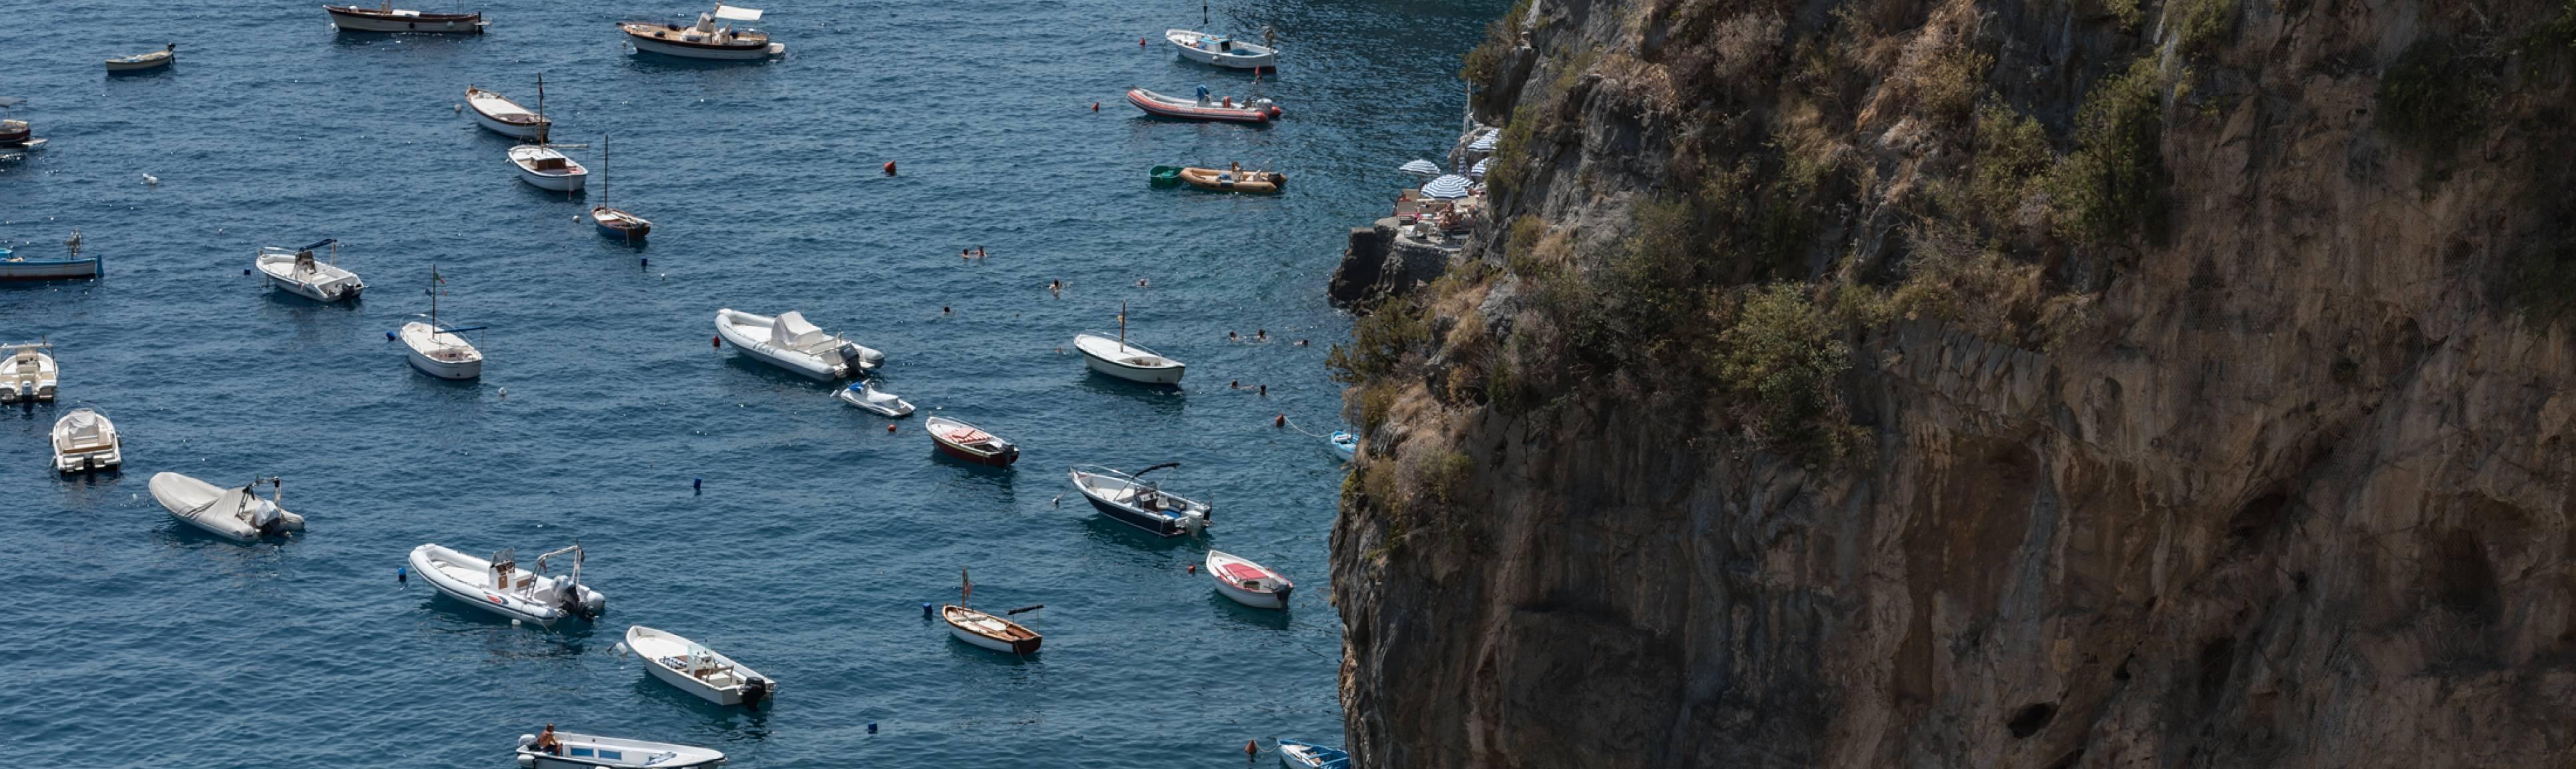 Cliff view looking down at ships at sea of the Amalfi Coast